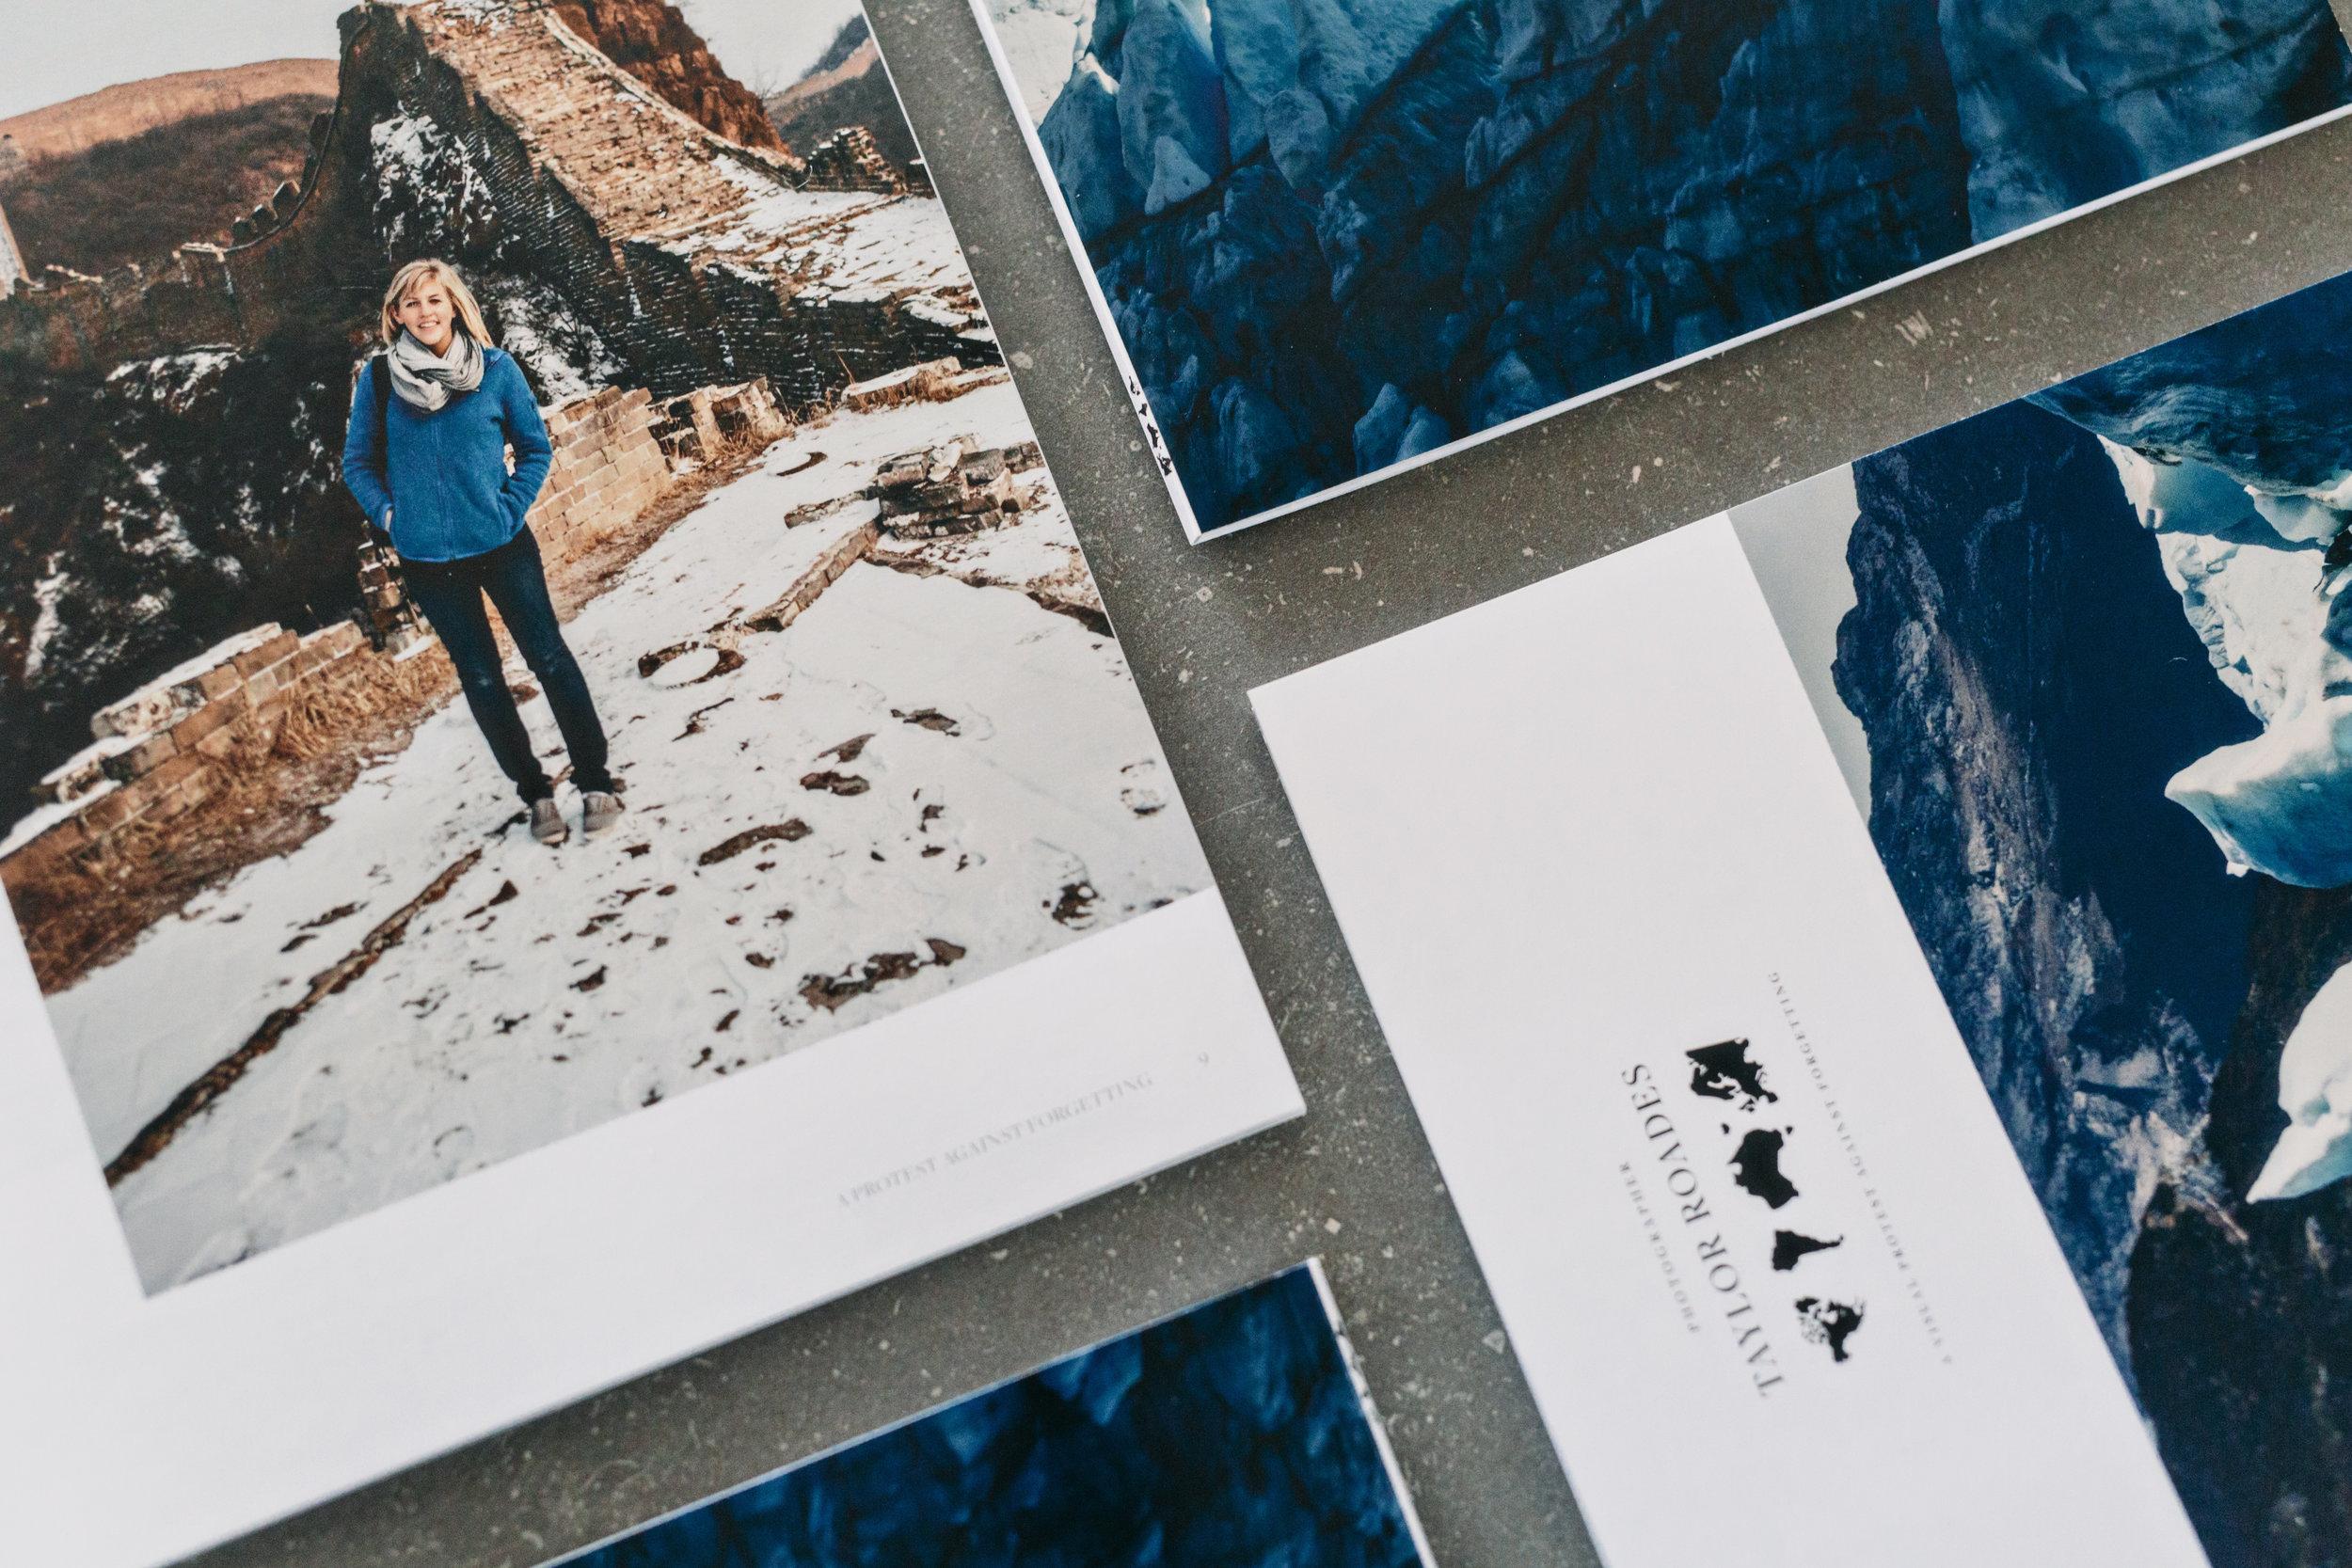 Promo-Books-Photos-TaylorRoades-0034.JPG